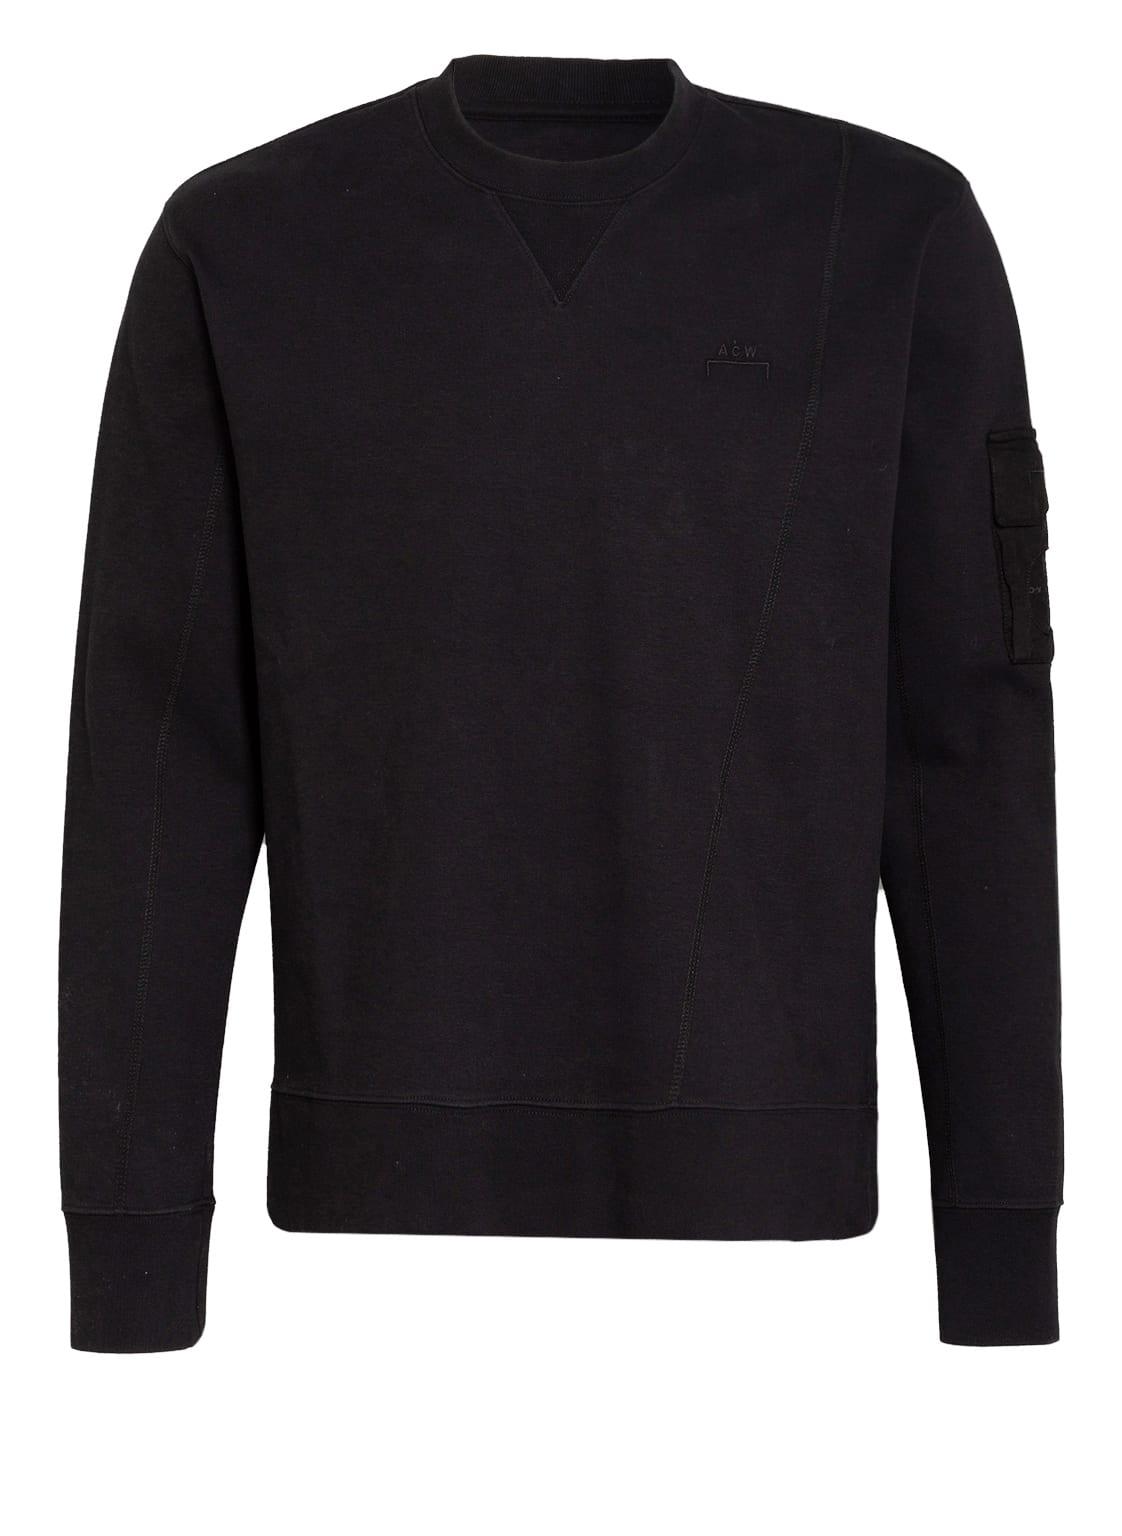 Image of A-Cold-Wall* Sweatshirt schwarz